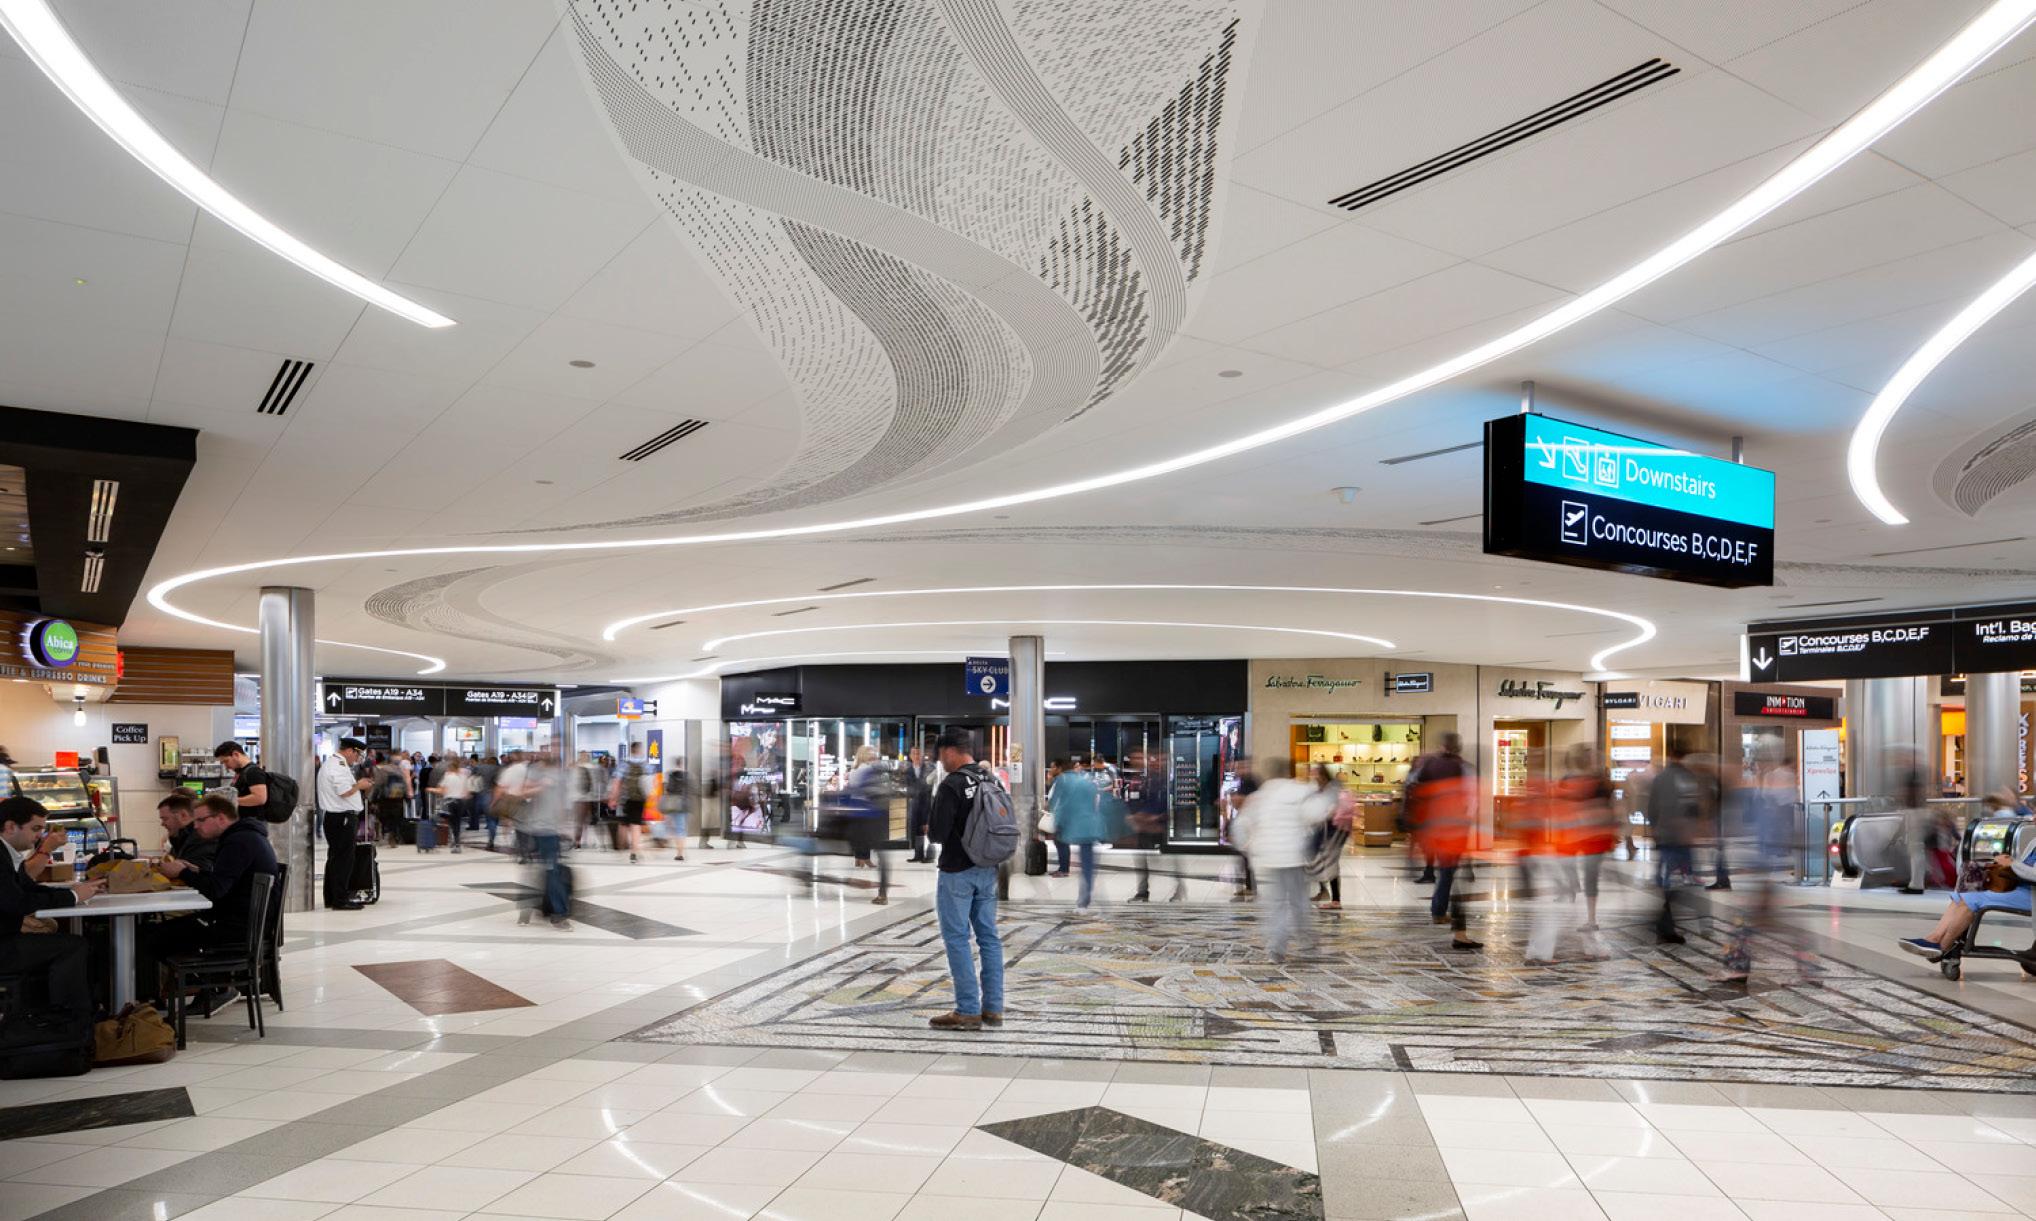 Hartsfield Jackson Atlanta International Airport